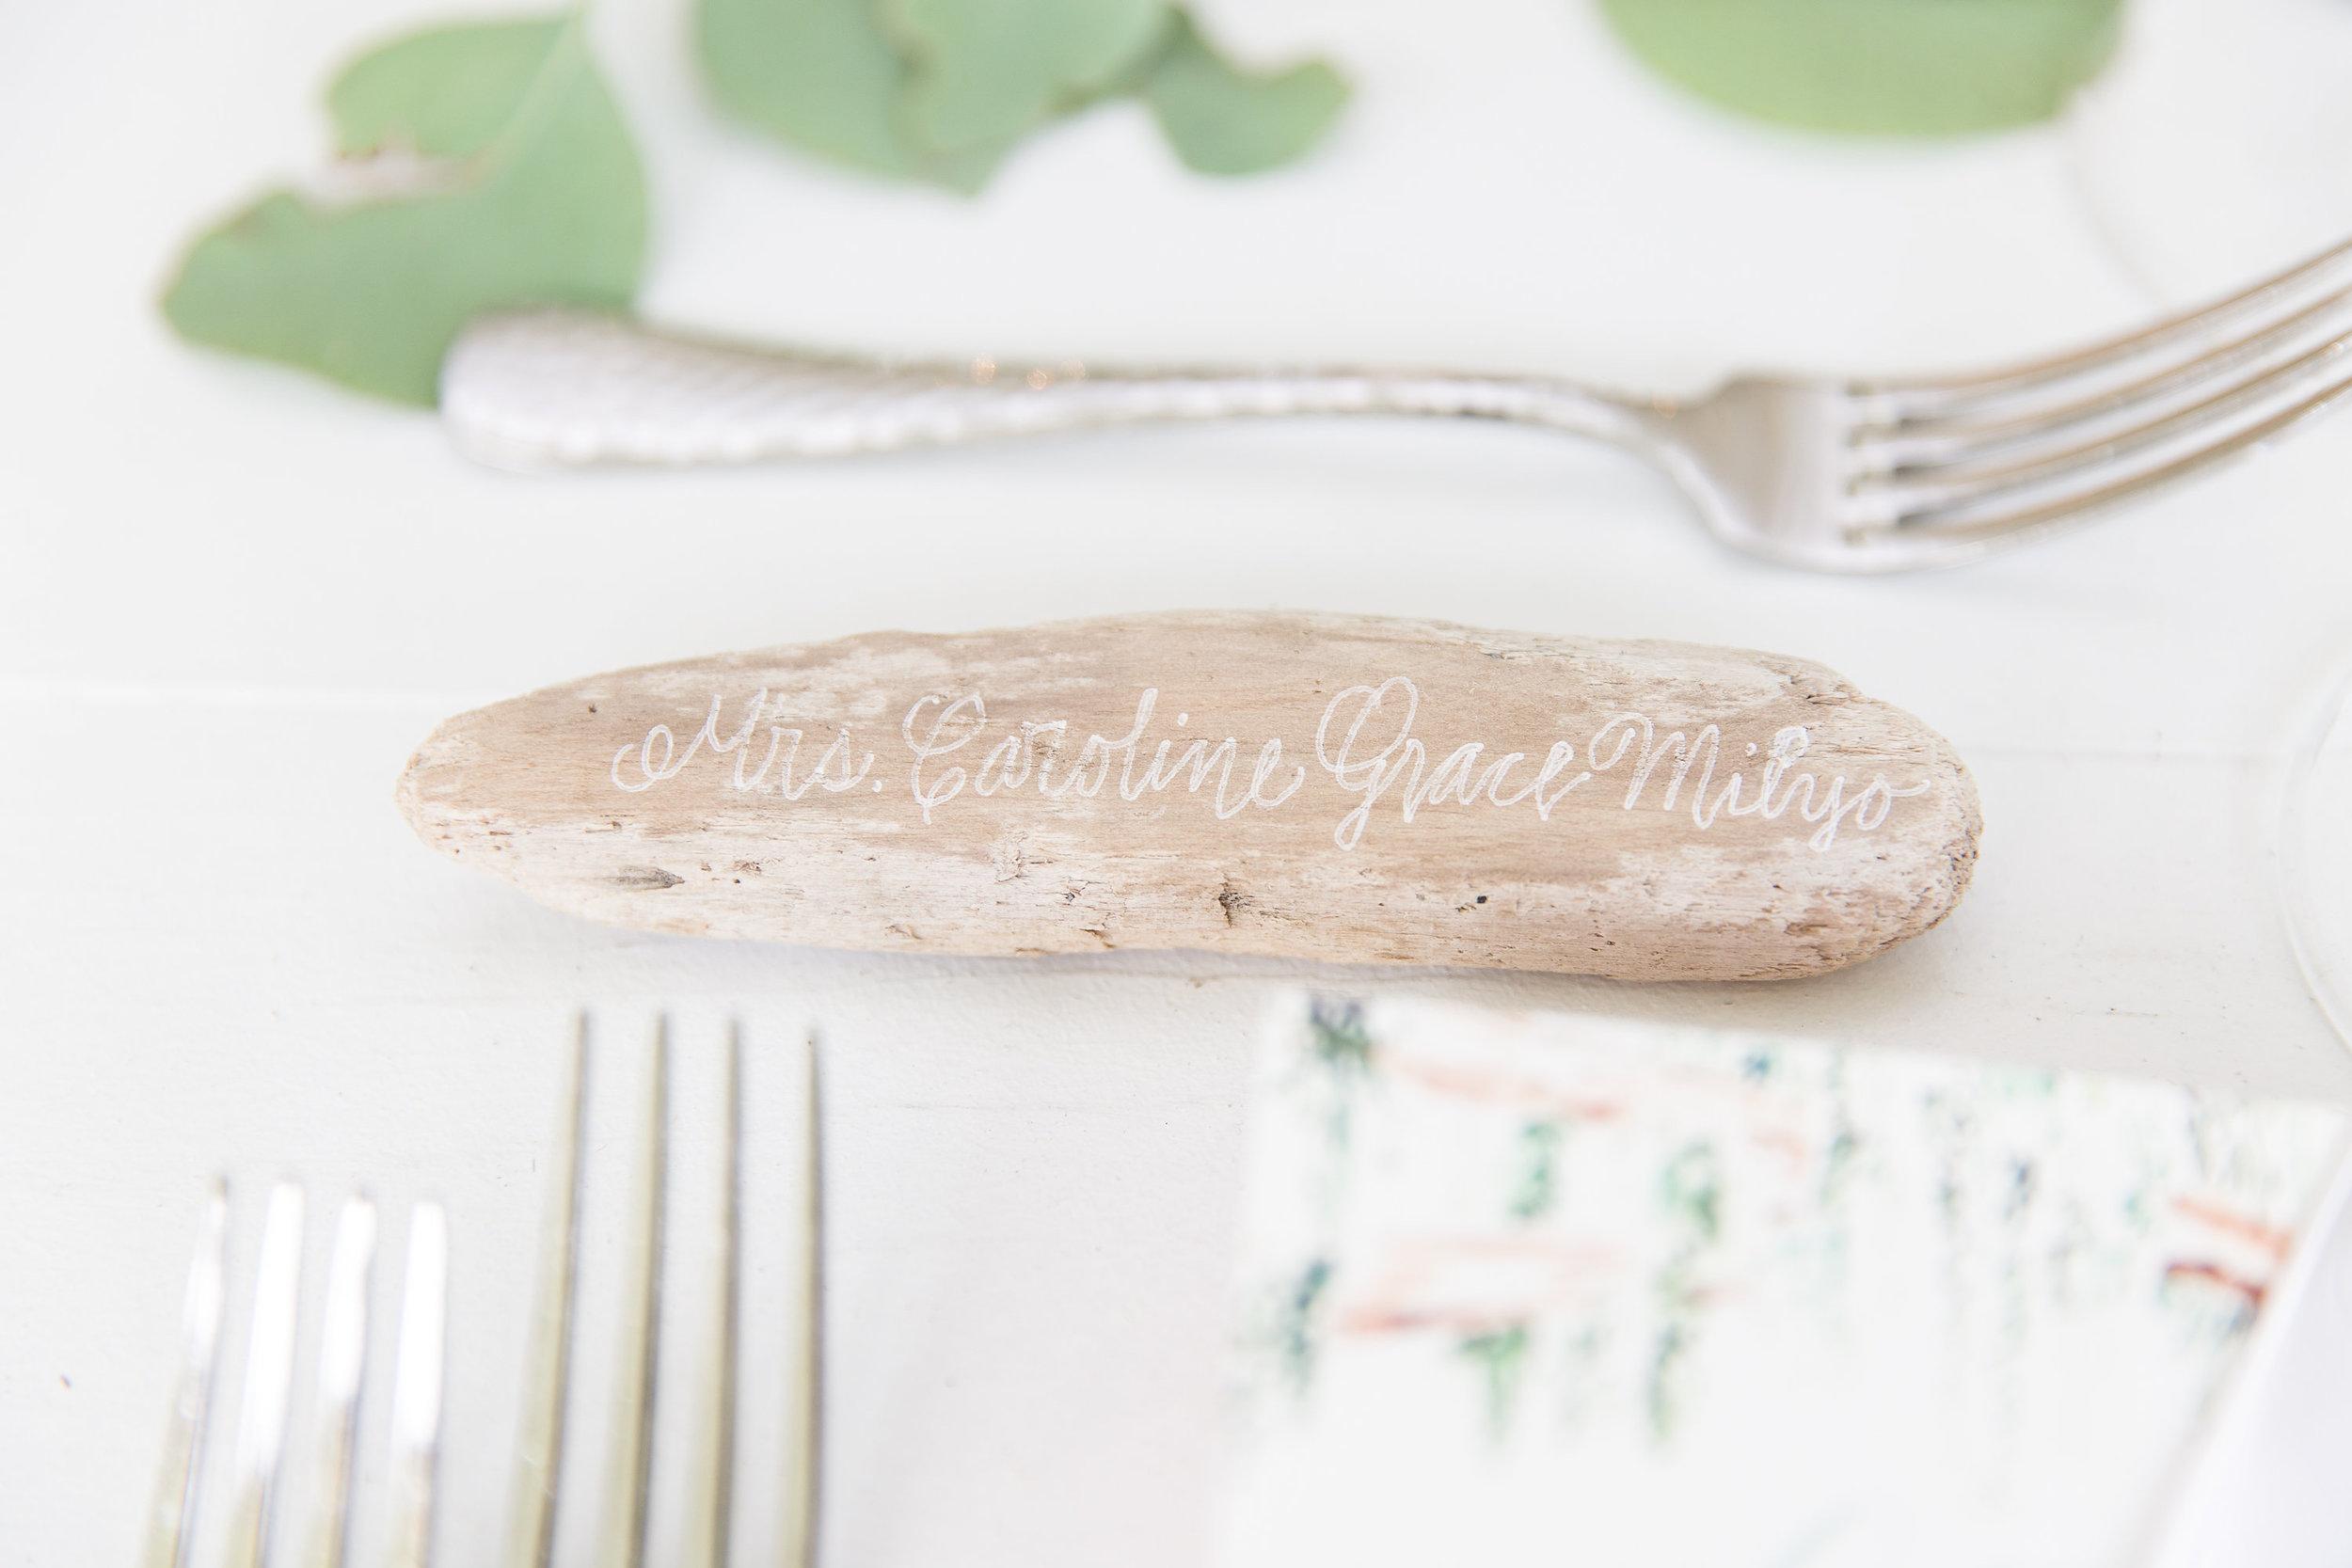 Driftwood escort cards for wedding at Beaufort SC  //  Hilton Head florist Urban Poppy  //  A Lowcountry Wedding Magazine